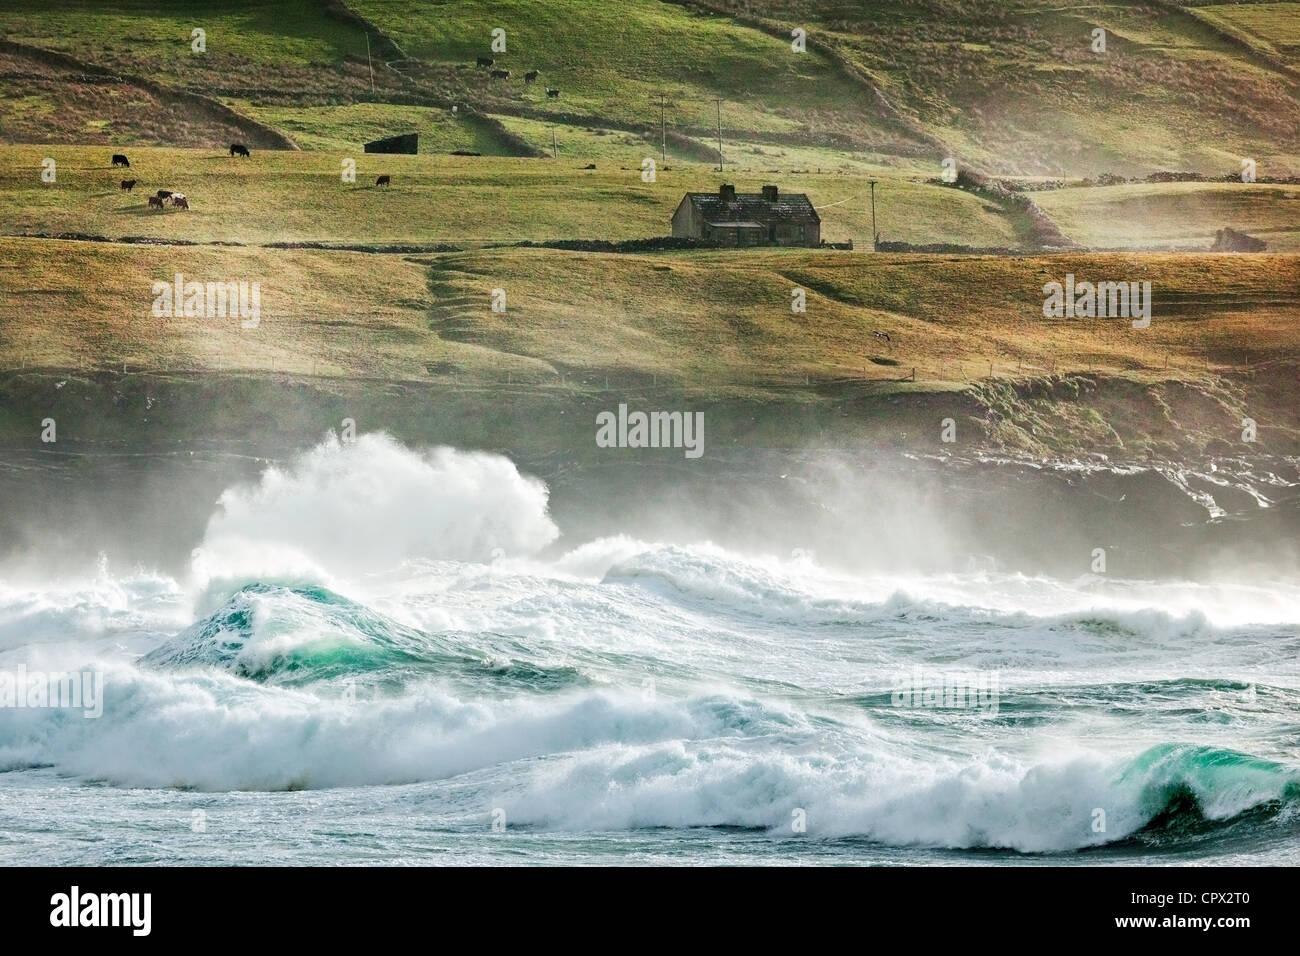 Waves, fisher street, doolin, county clare, ireland - Stock Image